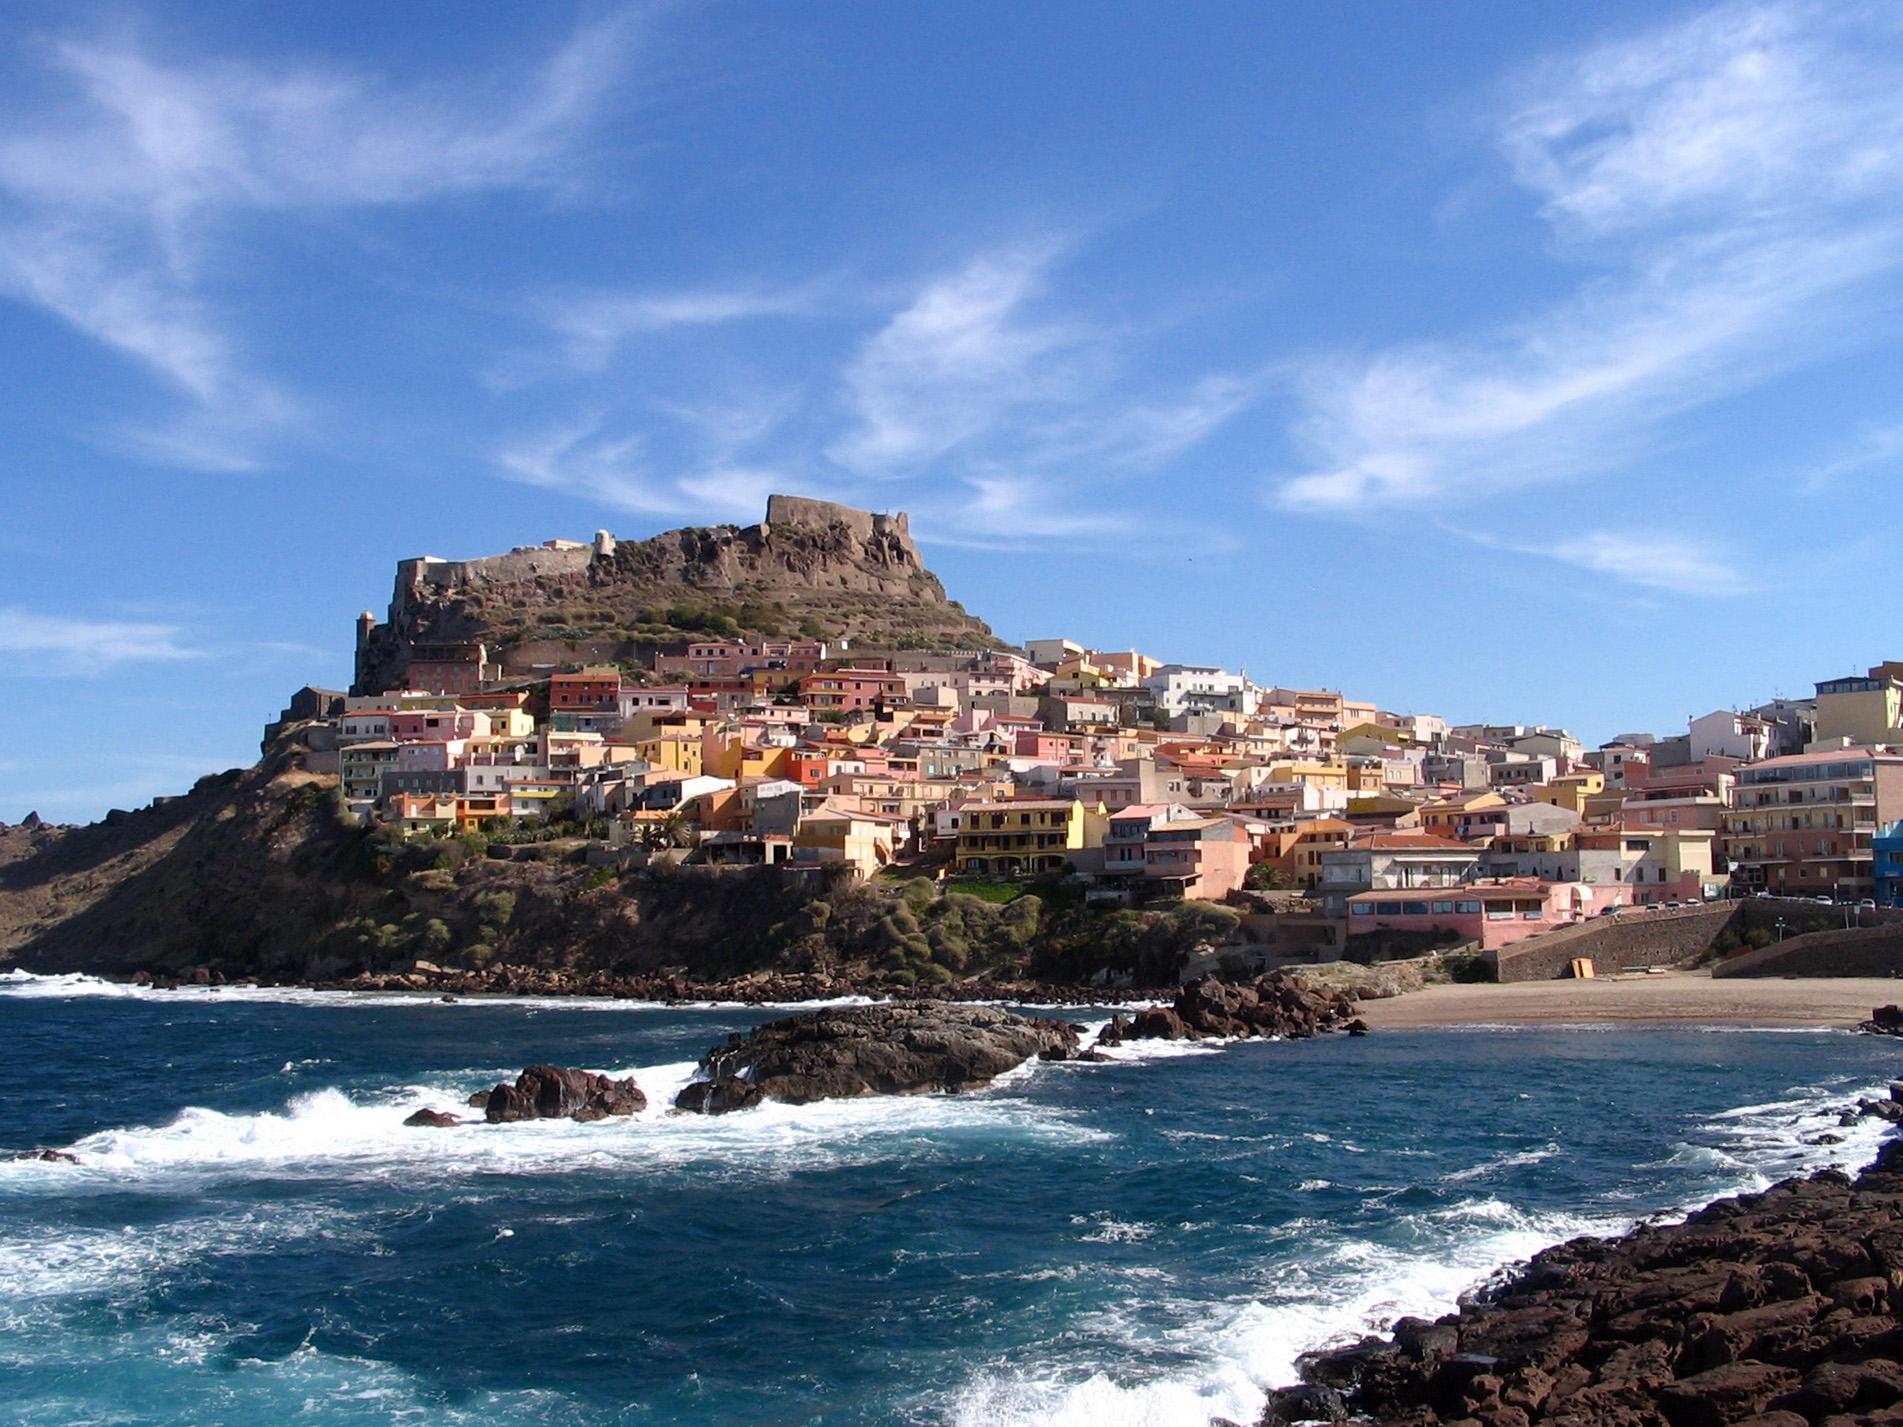 Castelsardo Cartina Sardegna.Castelsardo Wikipedia